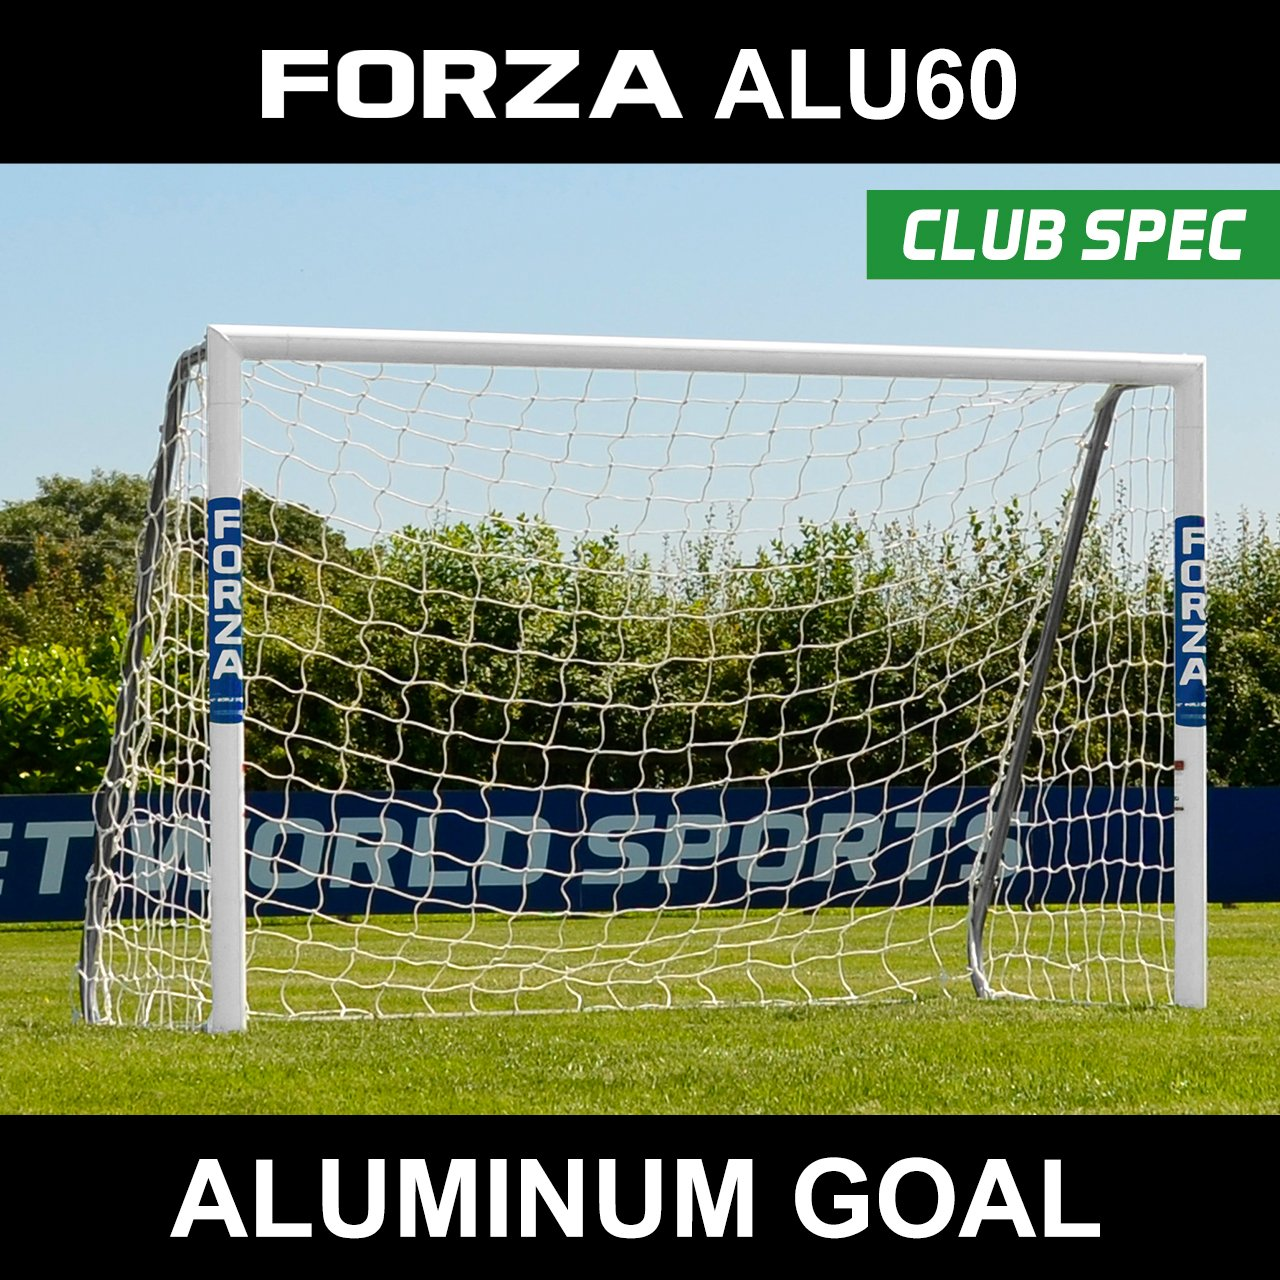 FORZA Alu60 サッカーゴール クラブ スペック アルミニウム製サッカーゴール (サイズは6フィート×4フィート~24フィート×8フィートから選択) 長持ち 耐候性 Alu60 サッカーゴール [Net World Sports] B018Y21CJ8 16ft x 7ft